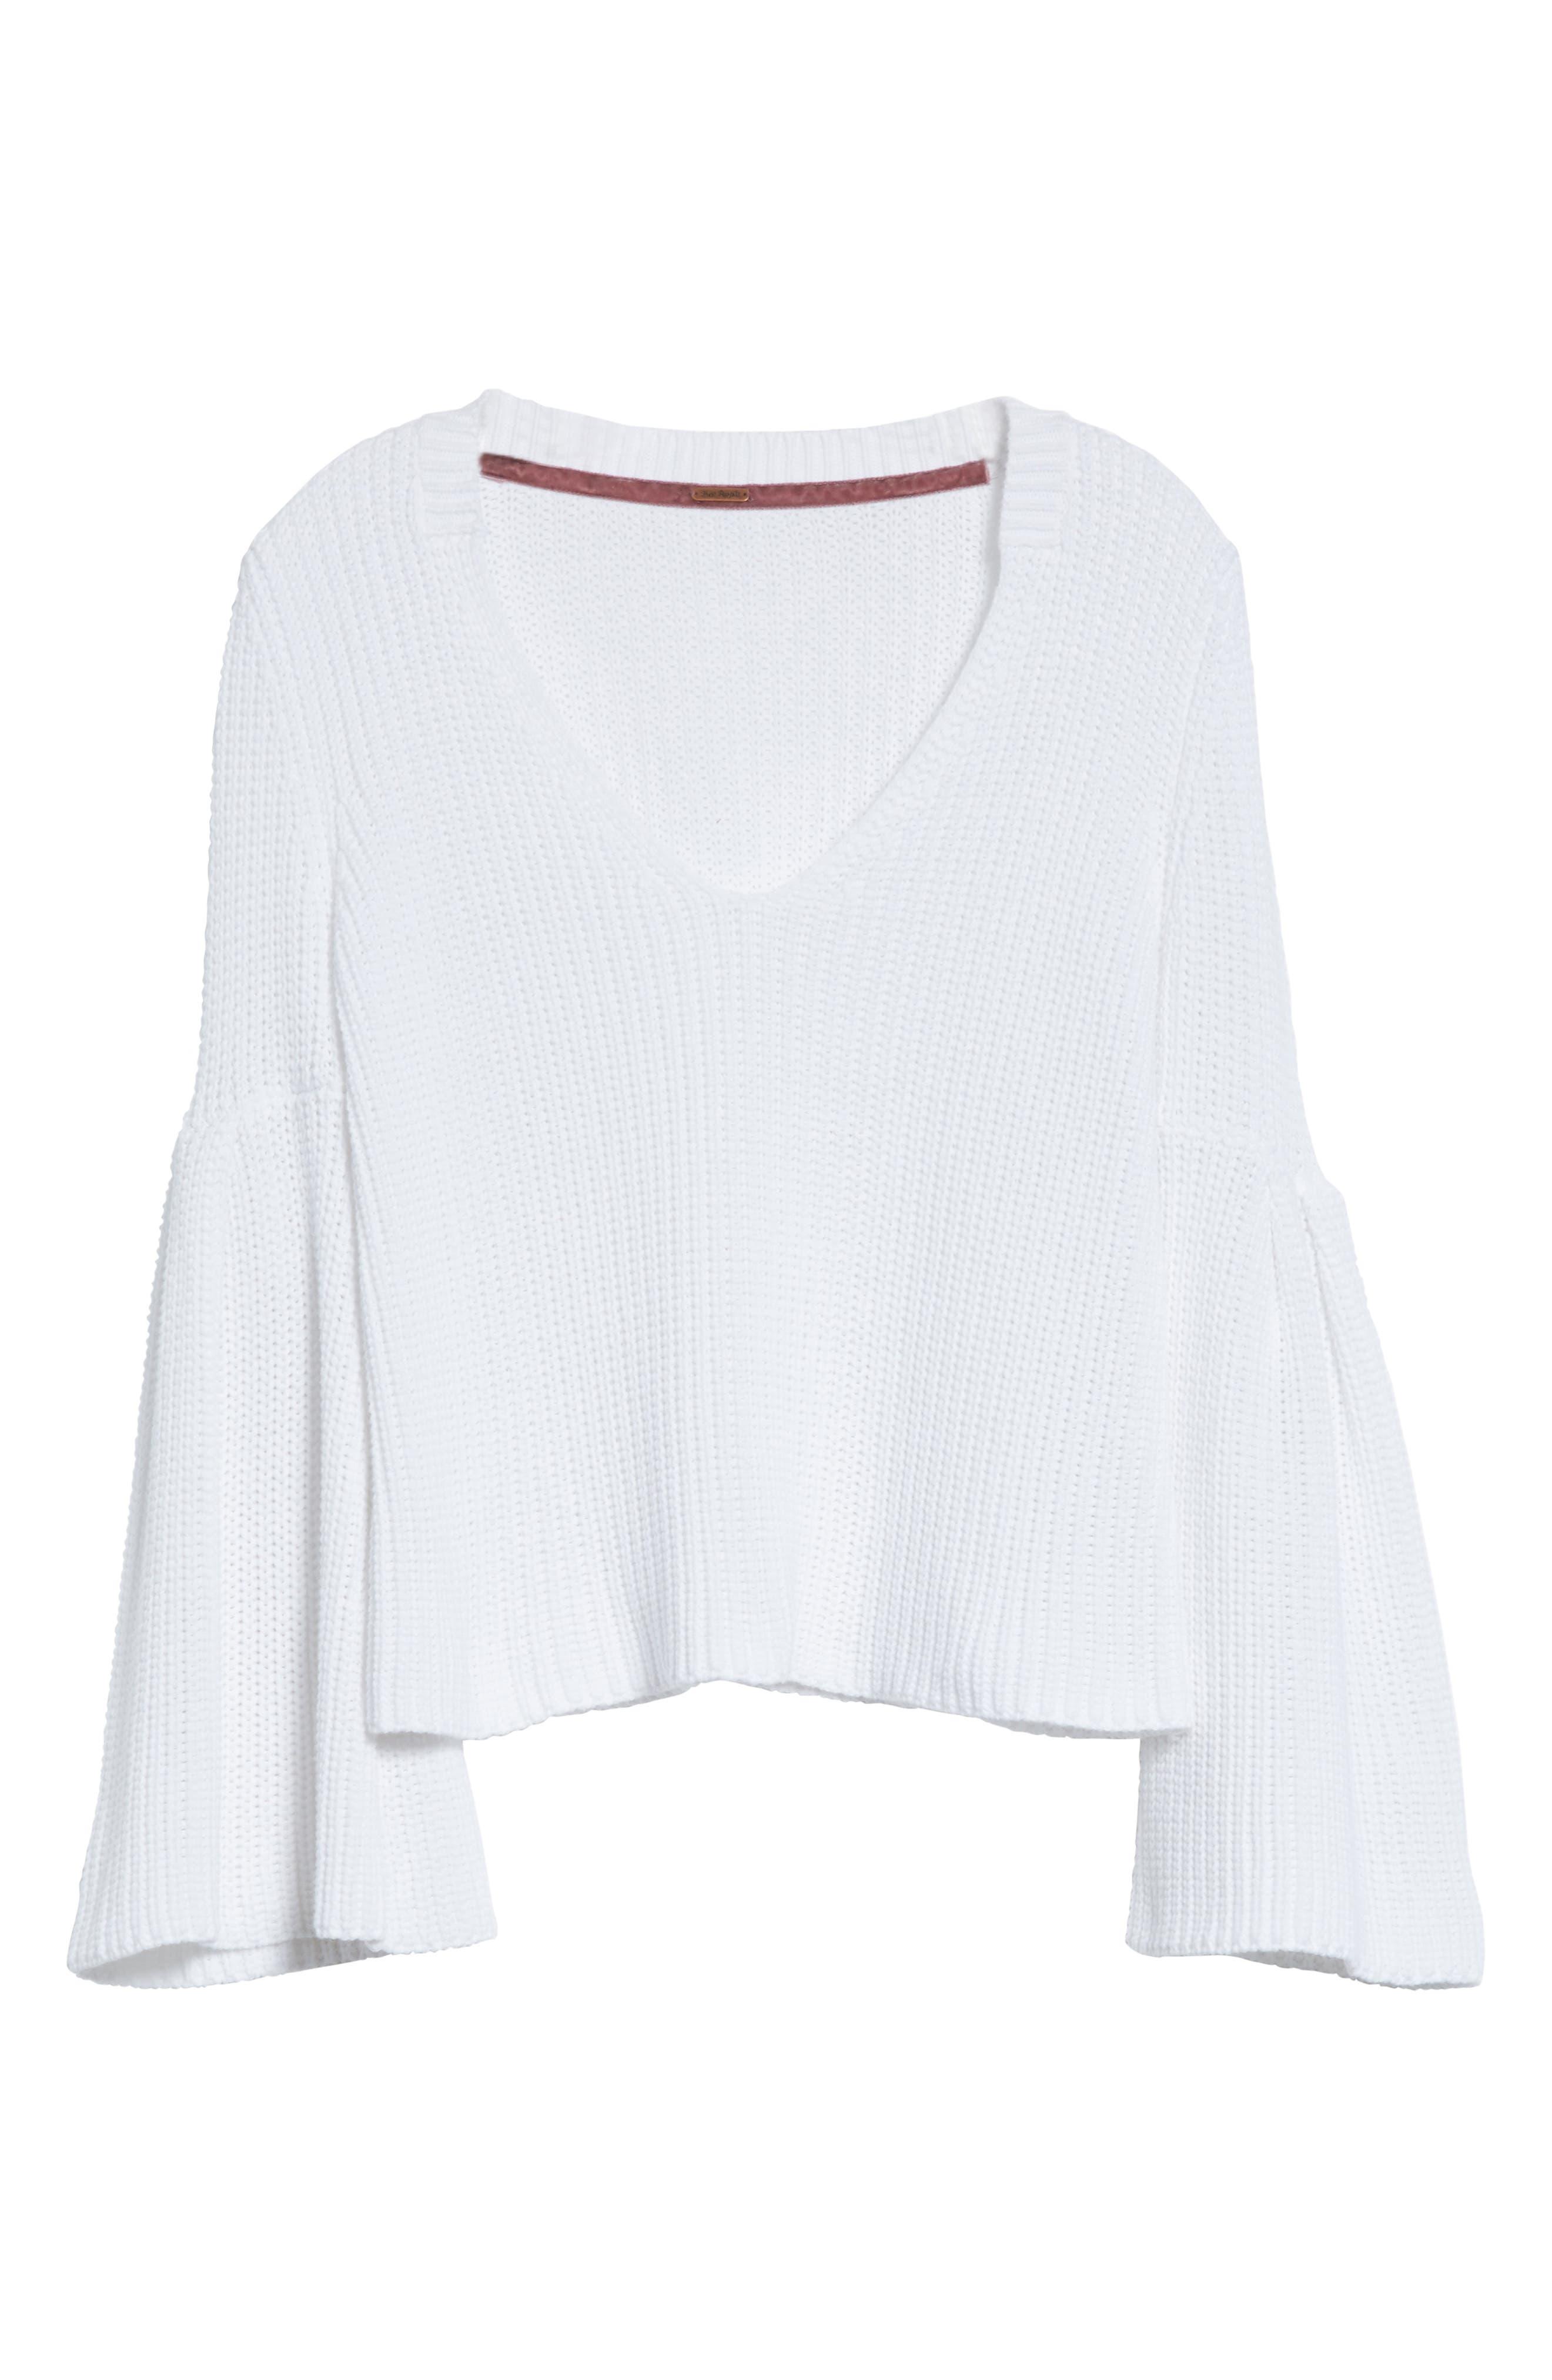 Damsel Bell Sleeve Pullover,                             Alternate thumbnail 6, color,                             White